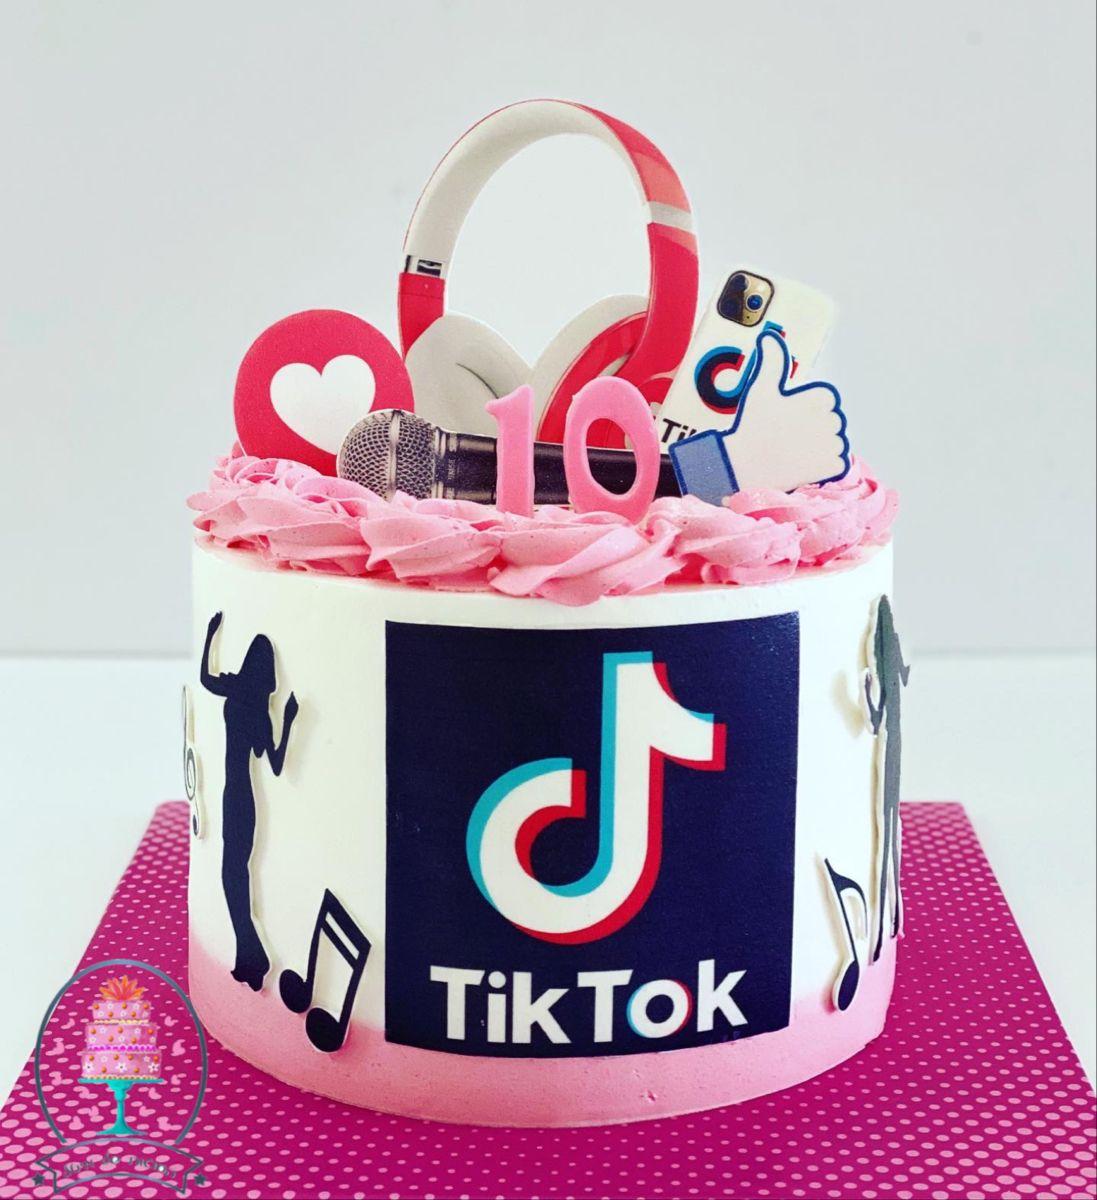 Tiktok Cake Cake Desserts Sweet